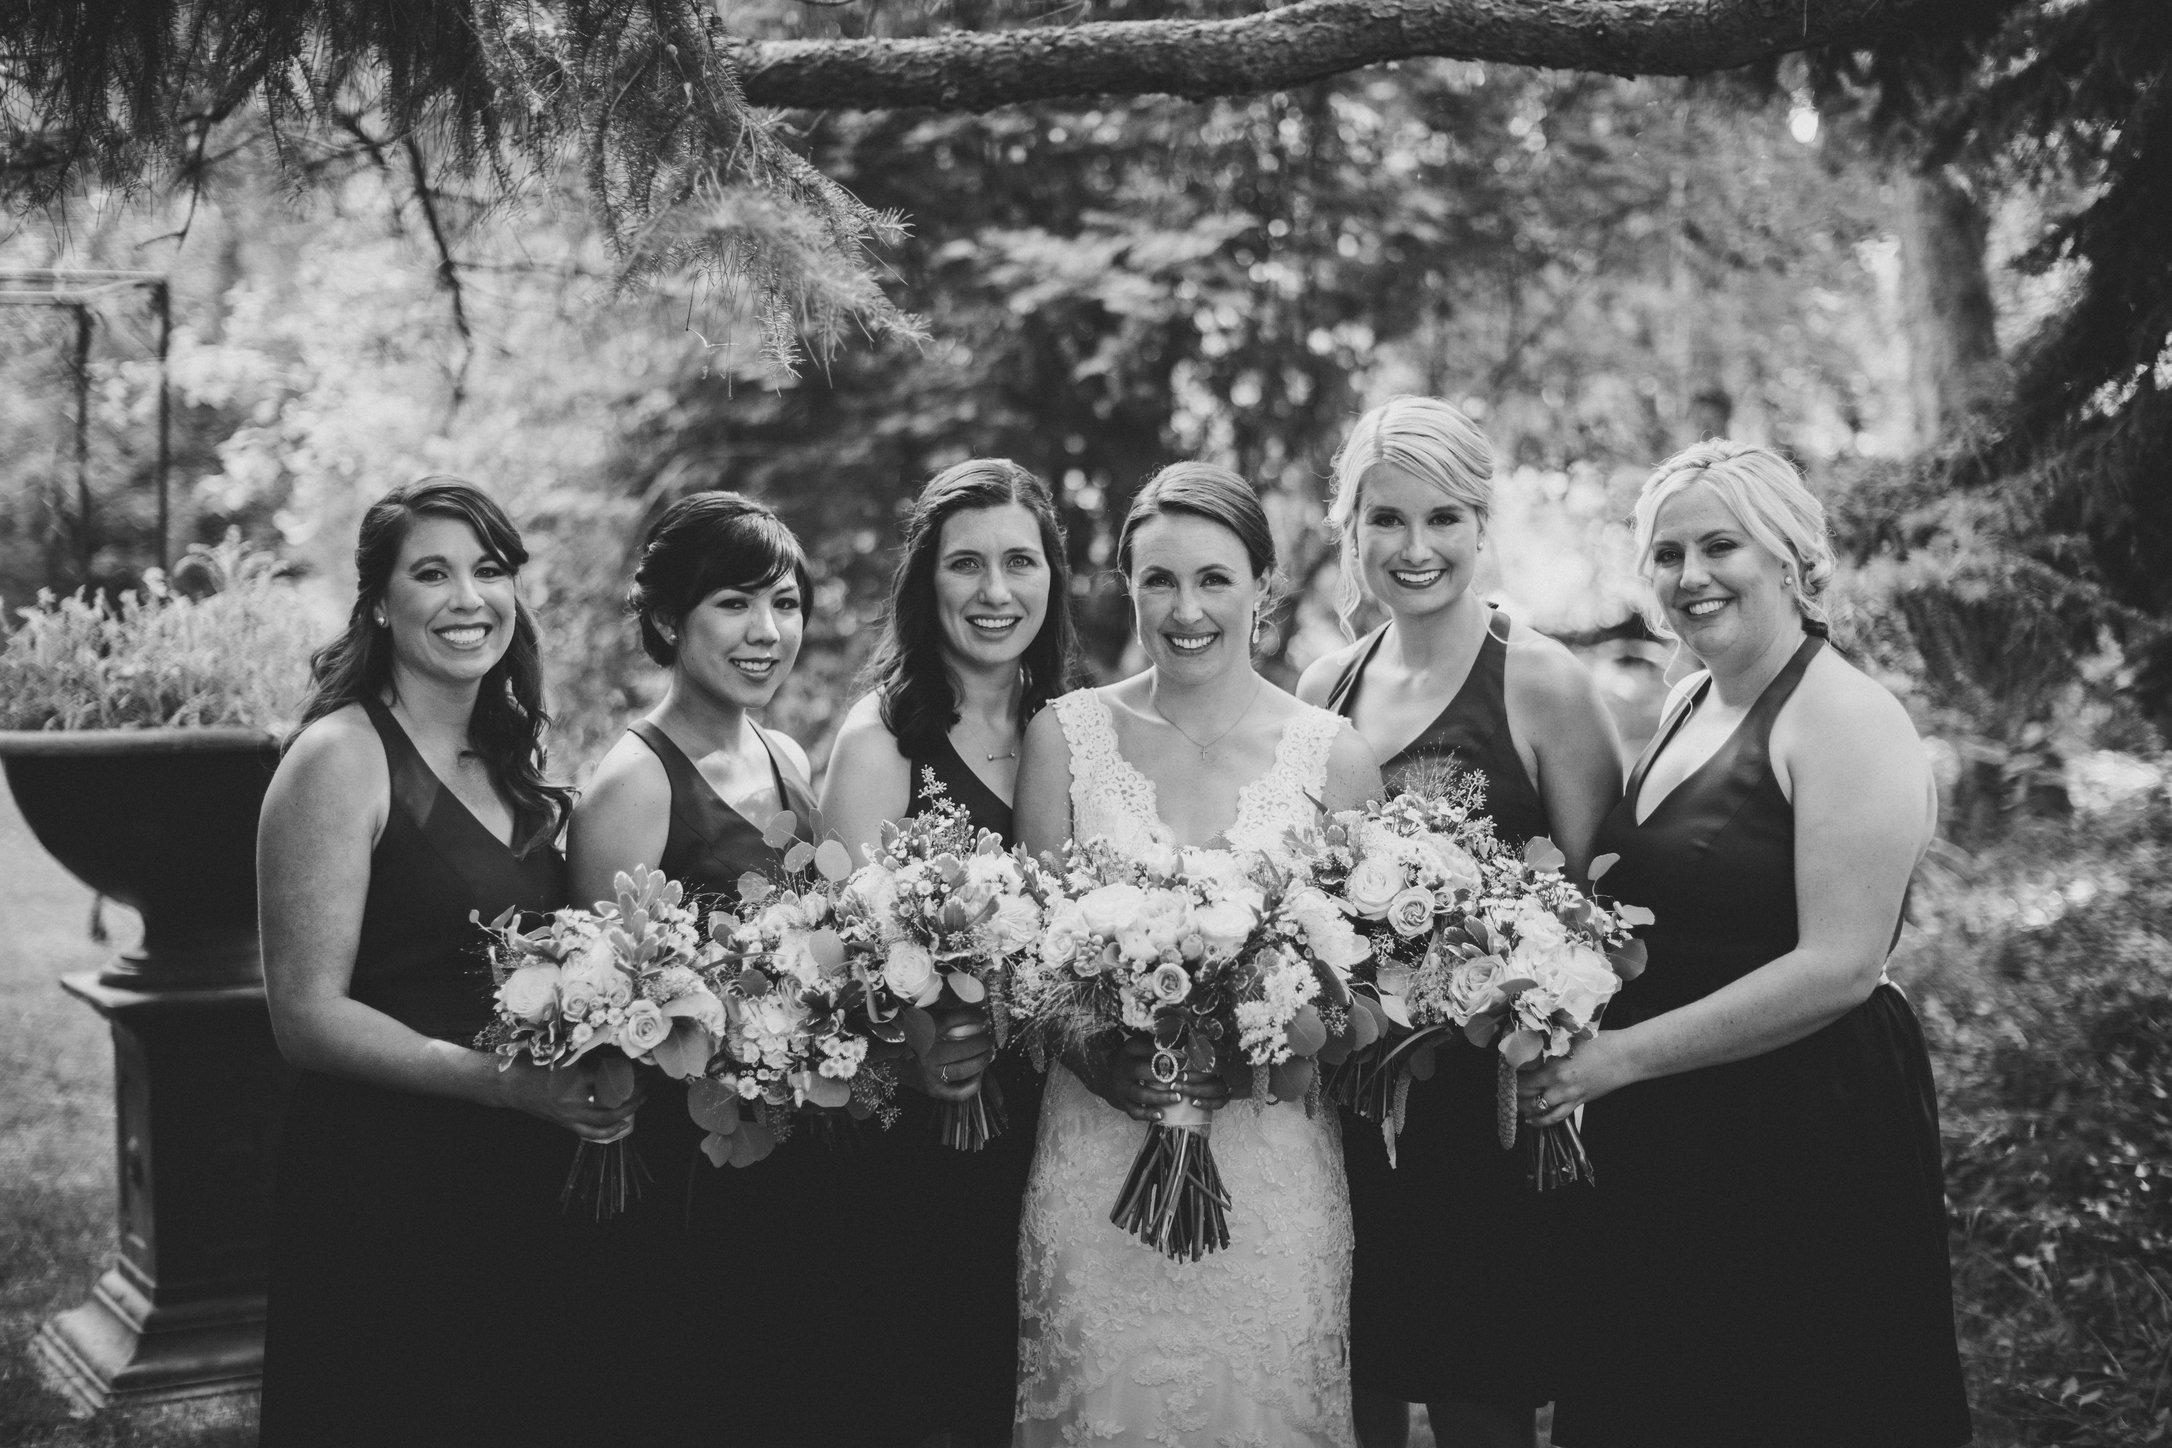 SandC-wedding-372.jpg